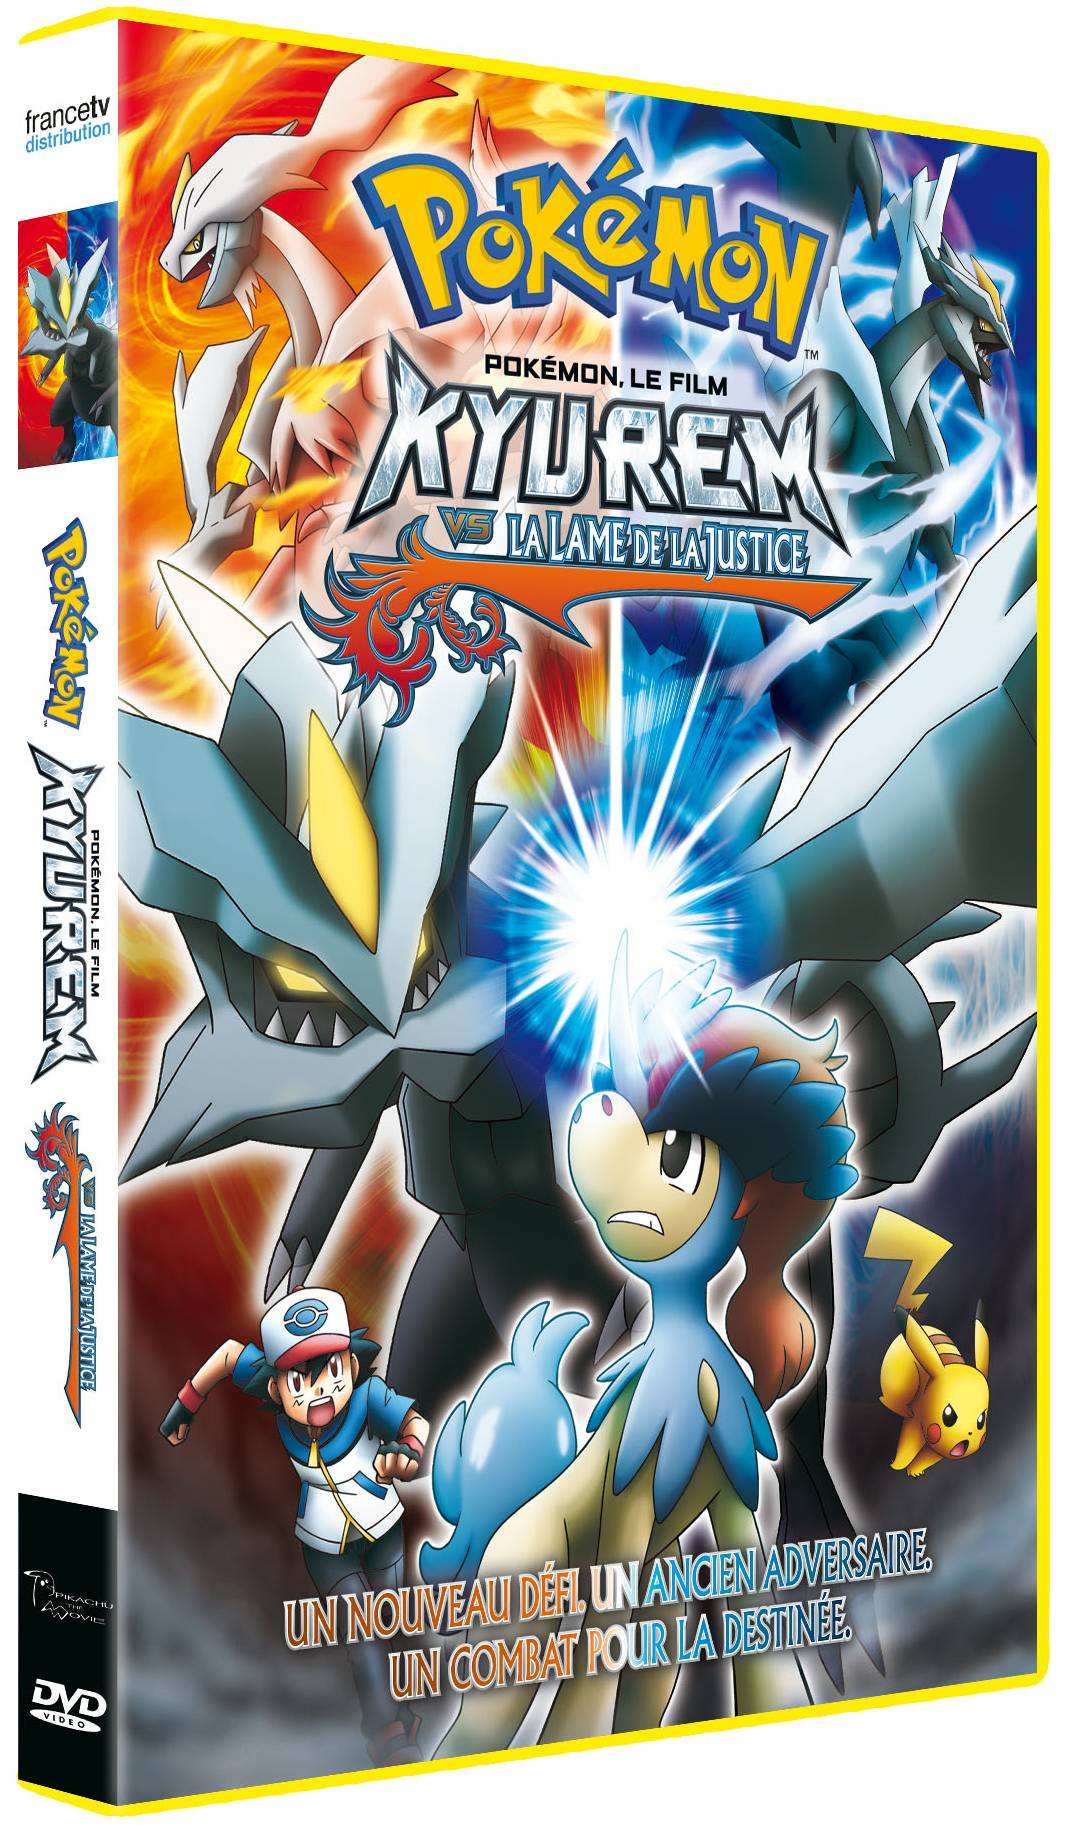 Pokémon - Film 15 - Kyurem vs la lame de la justice